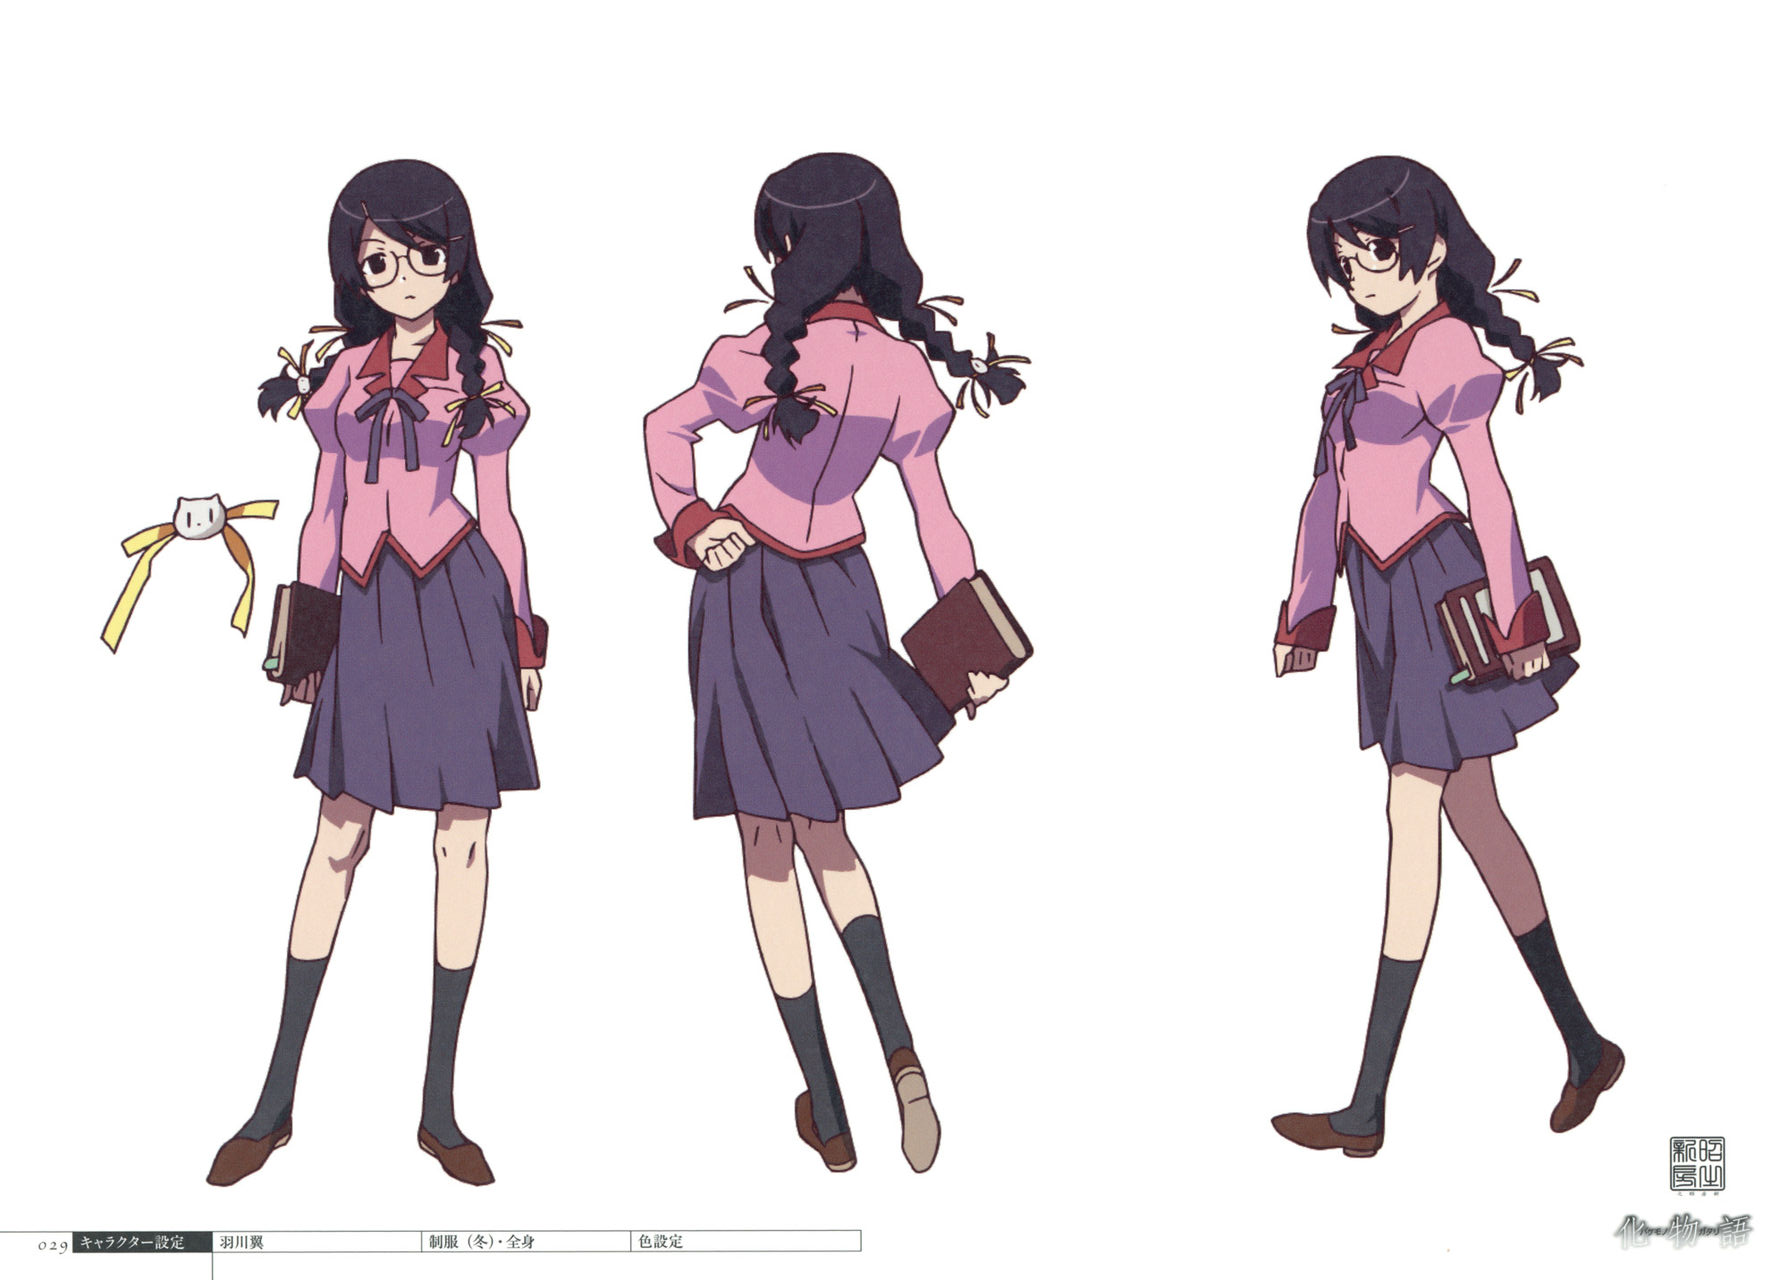 Tsubasa Hanekawa | Bakemonogatari Wiki | FANDOM powered by Wikia